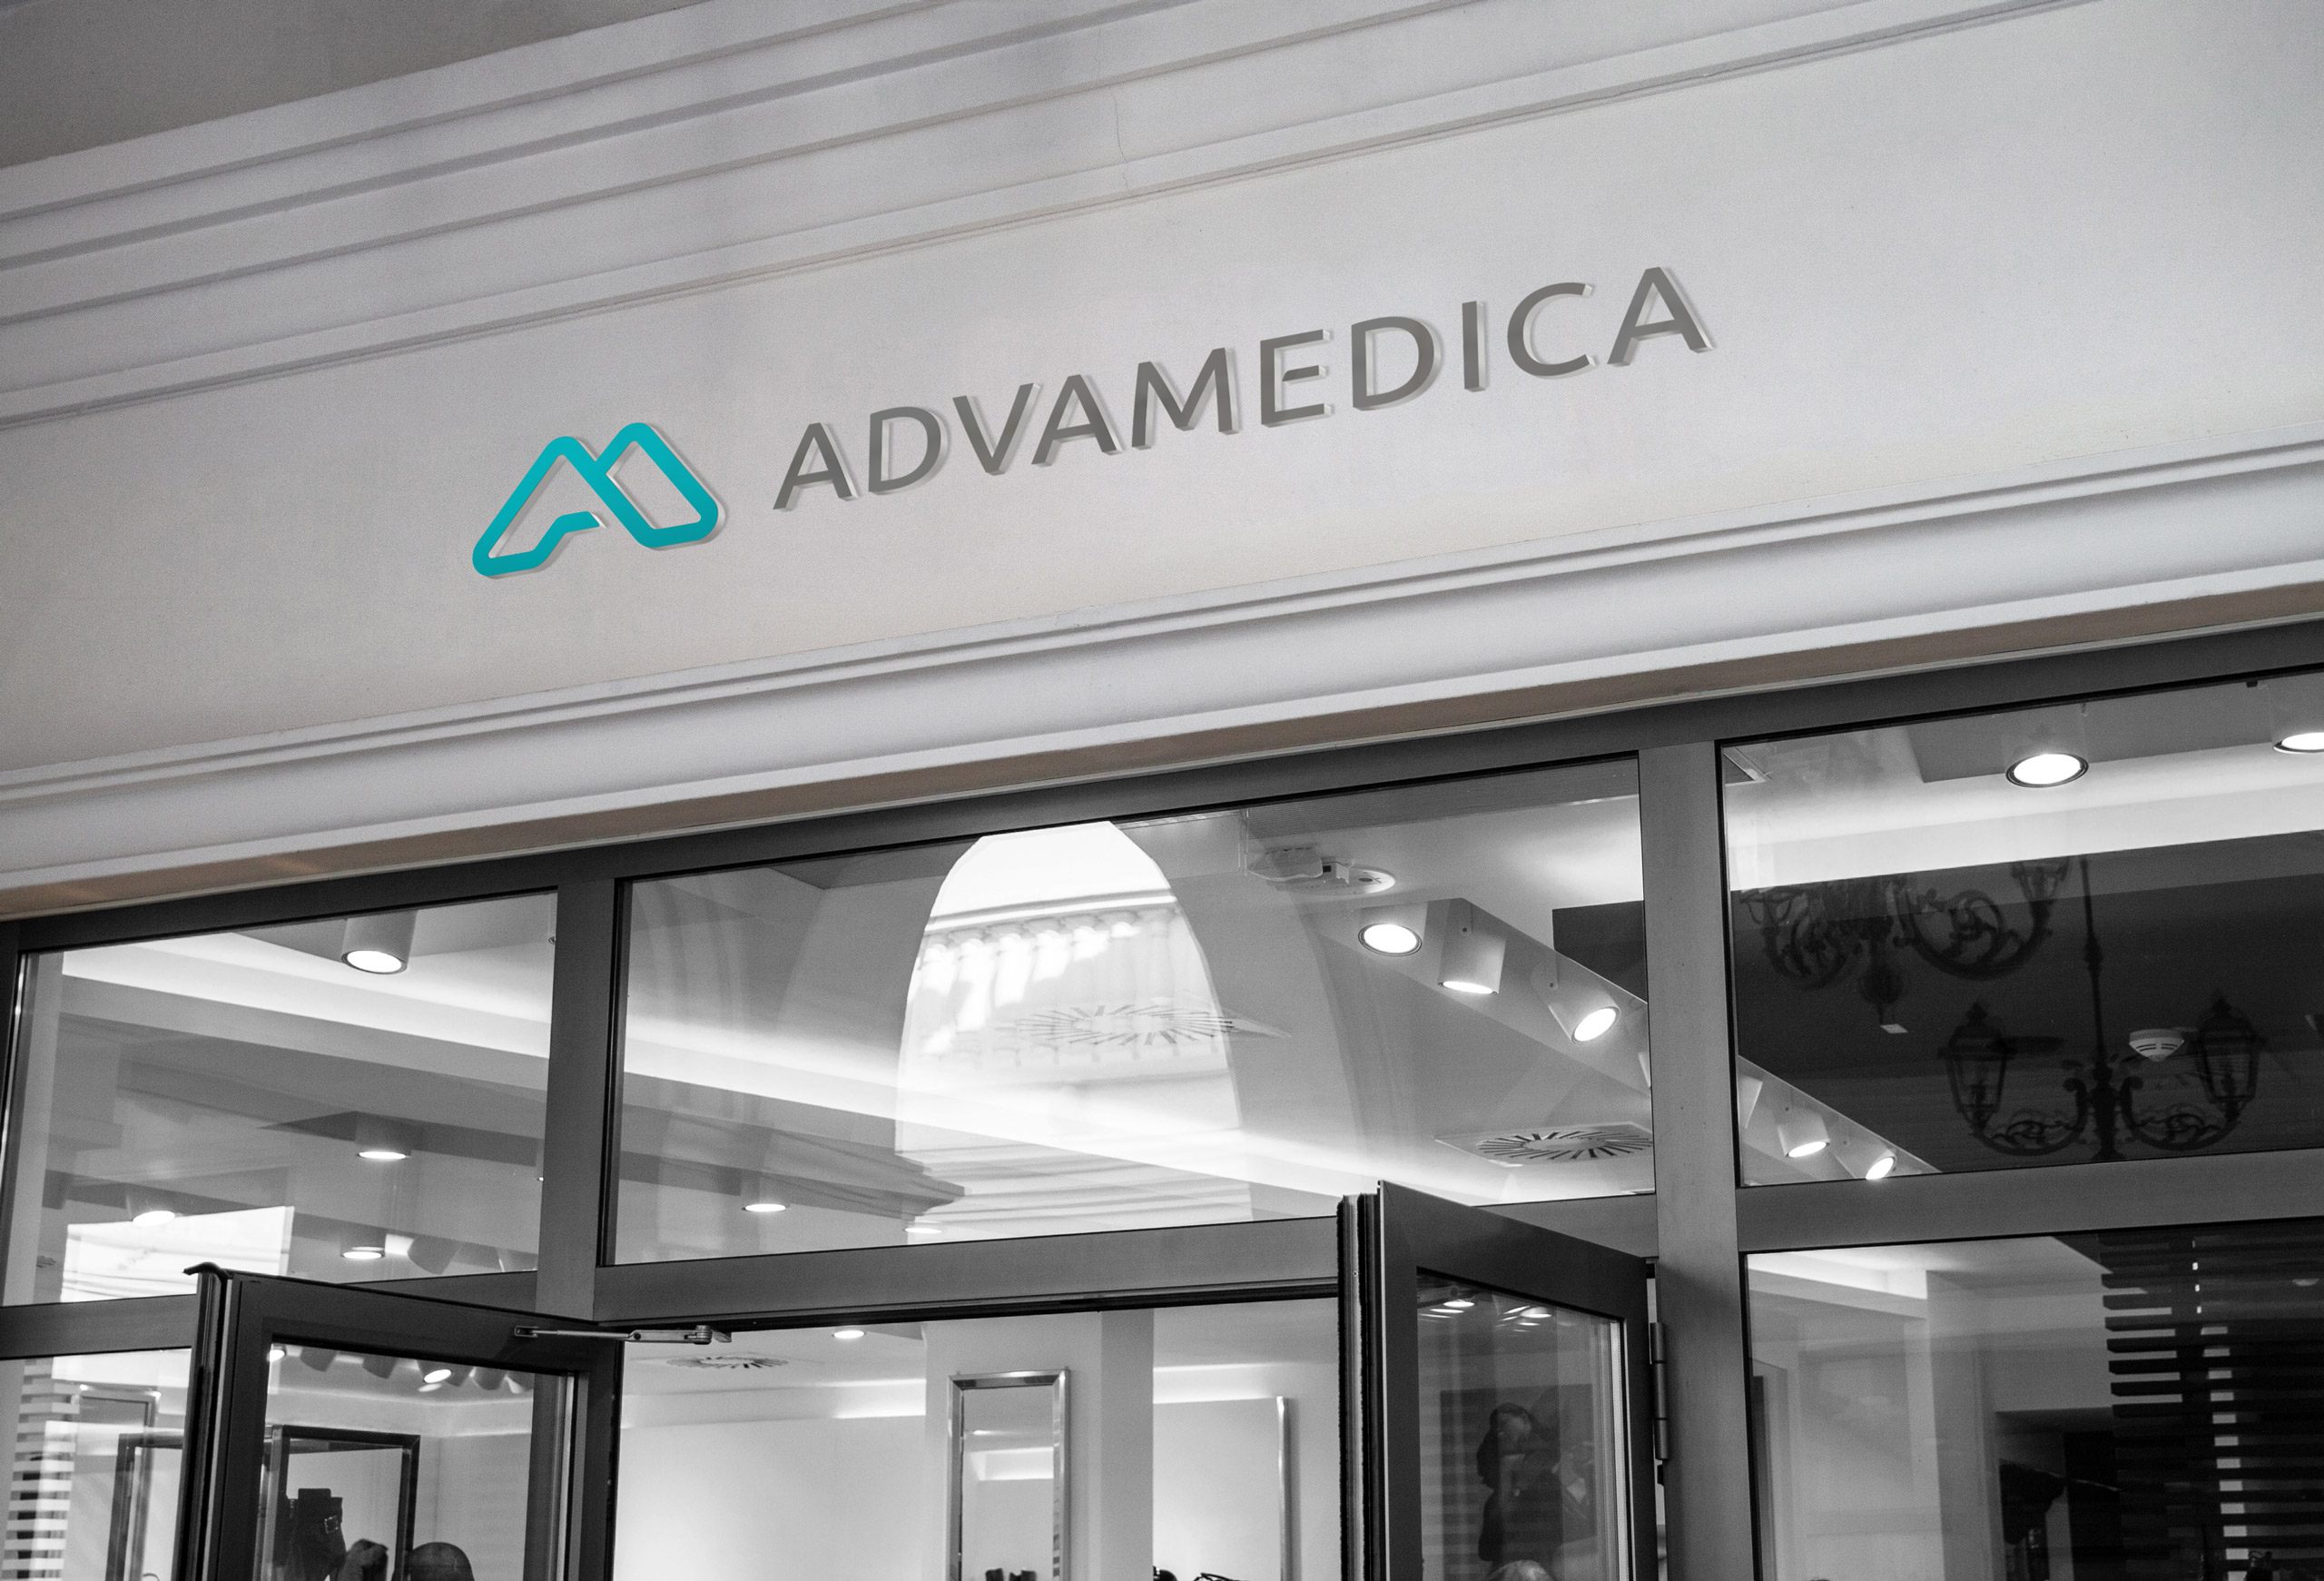 Store signage design for Advamedica